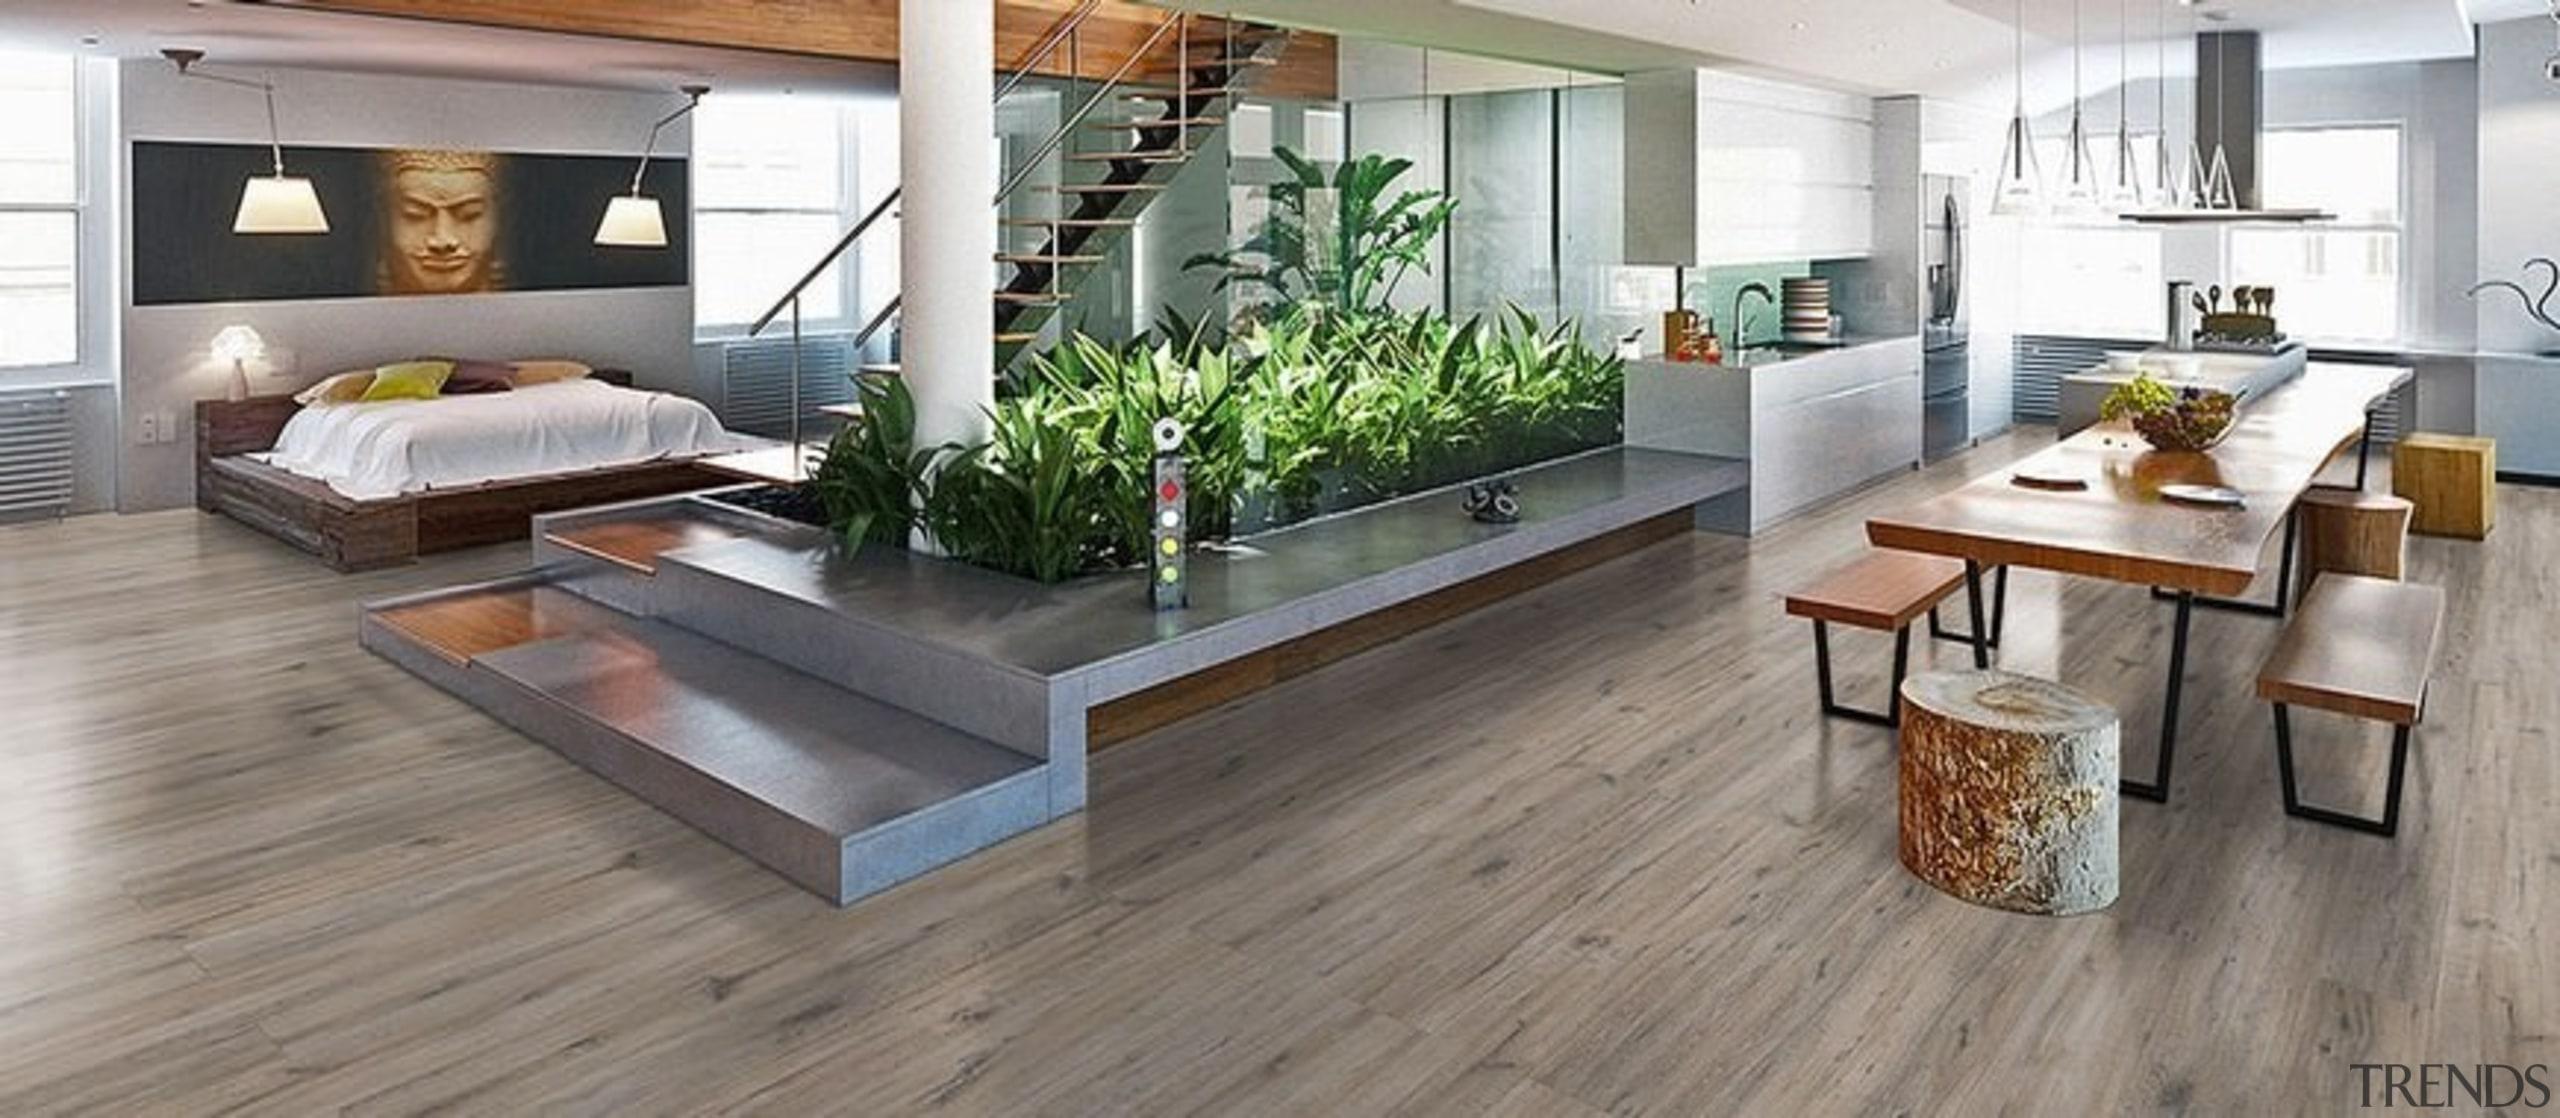 CERAMIN NEO 2.0 - CERAMIN NEO 2.0 - floor, flooring, hardwood, interior design, laminate flooring, living room, wood, wood flooring, gray, white